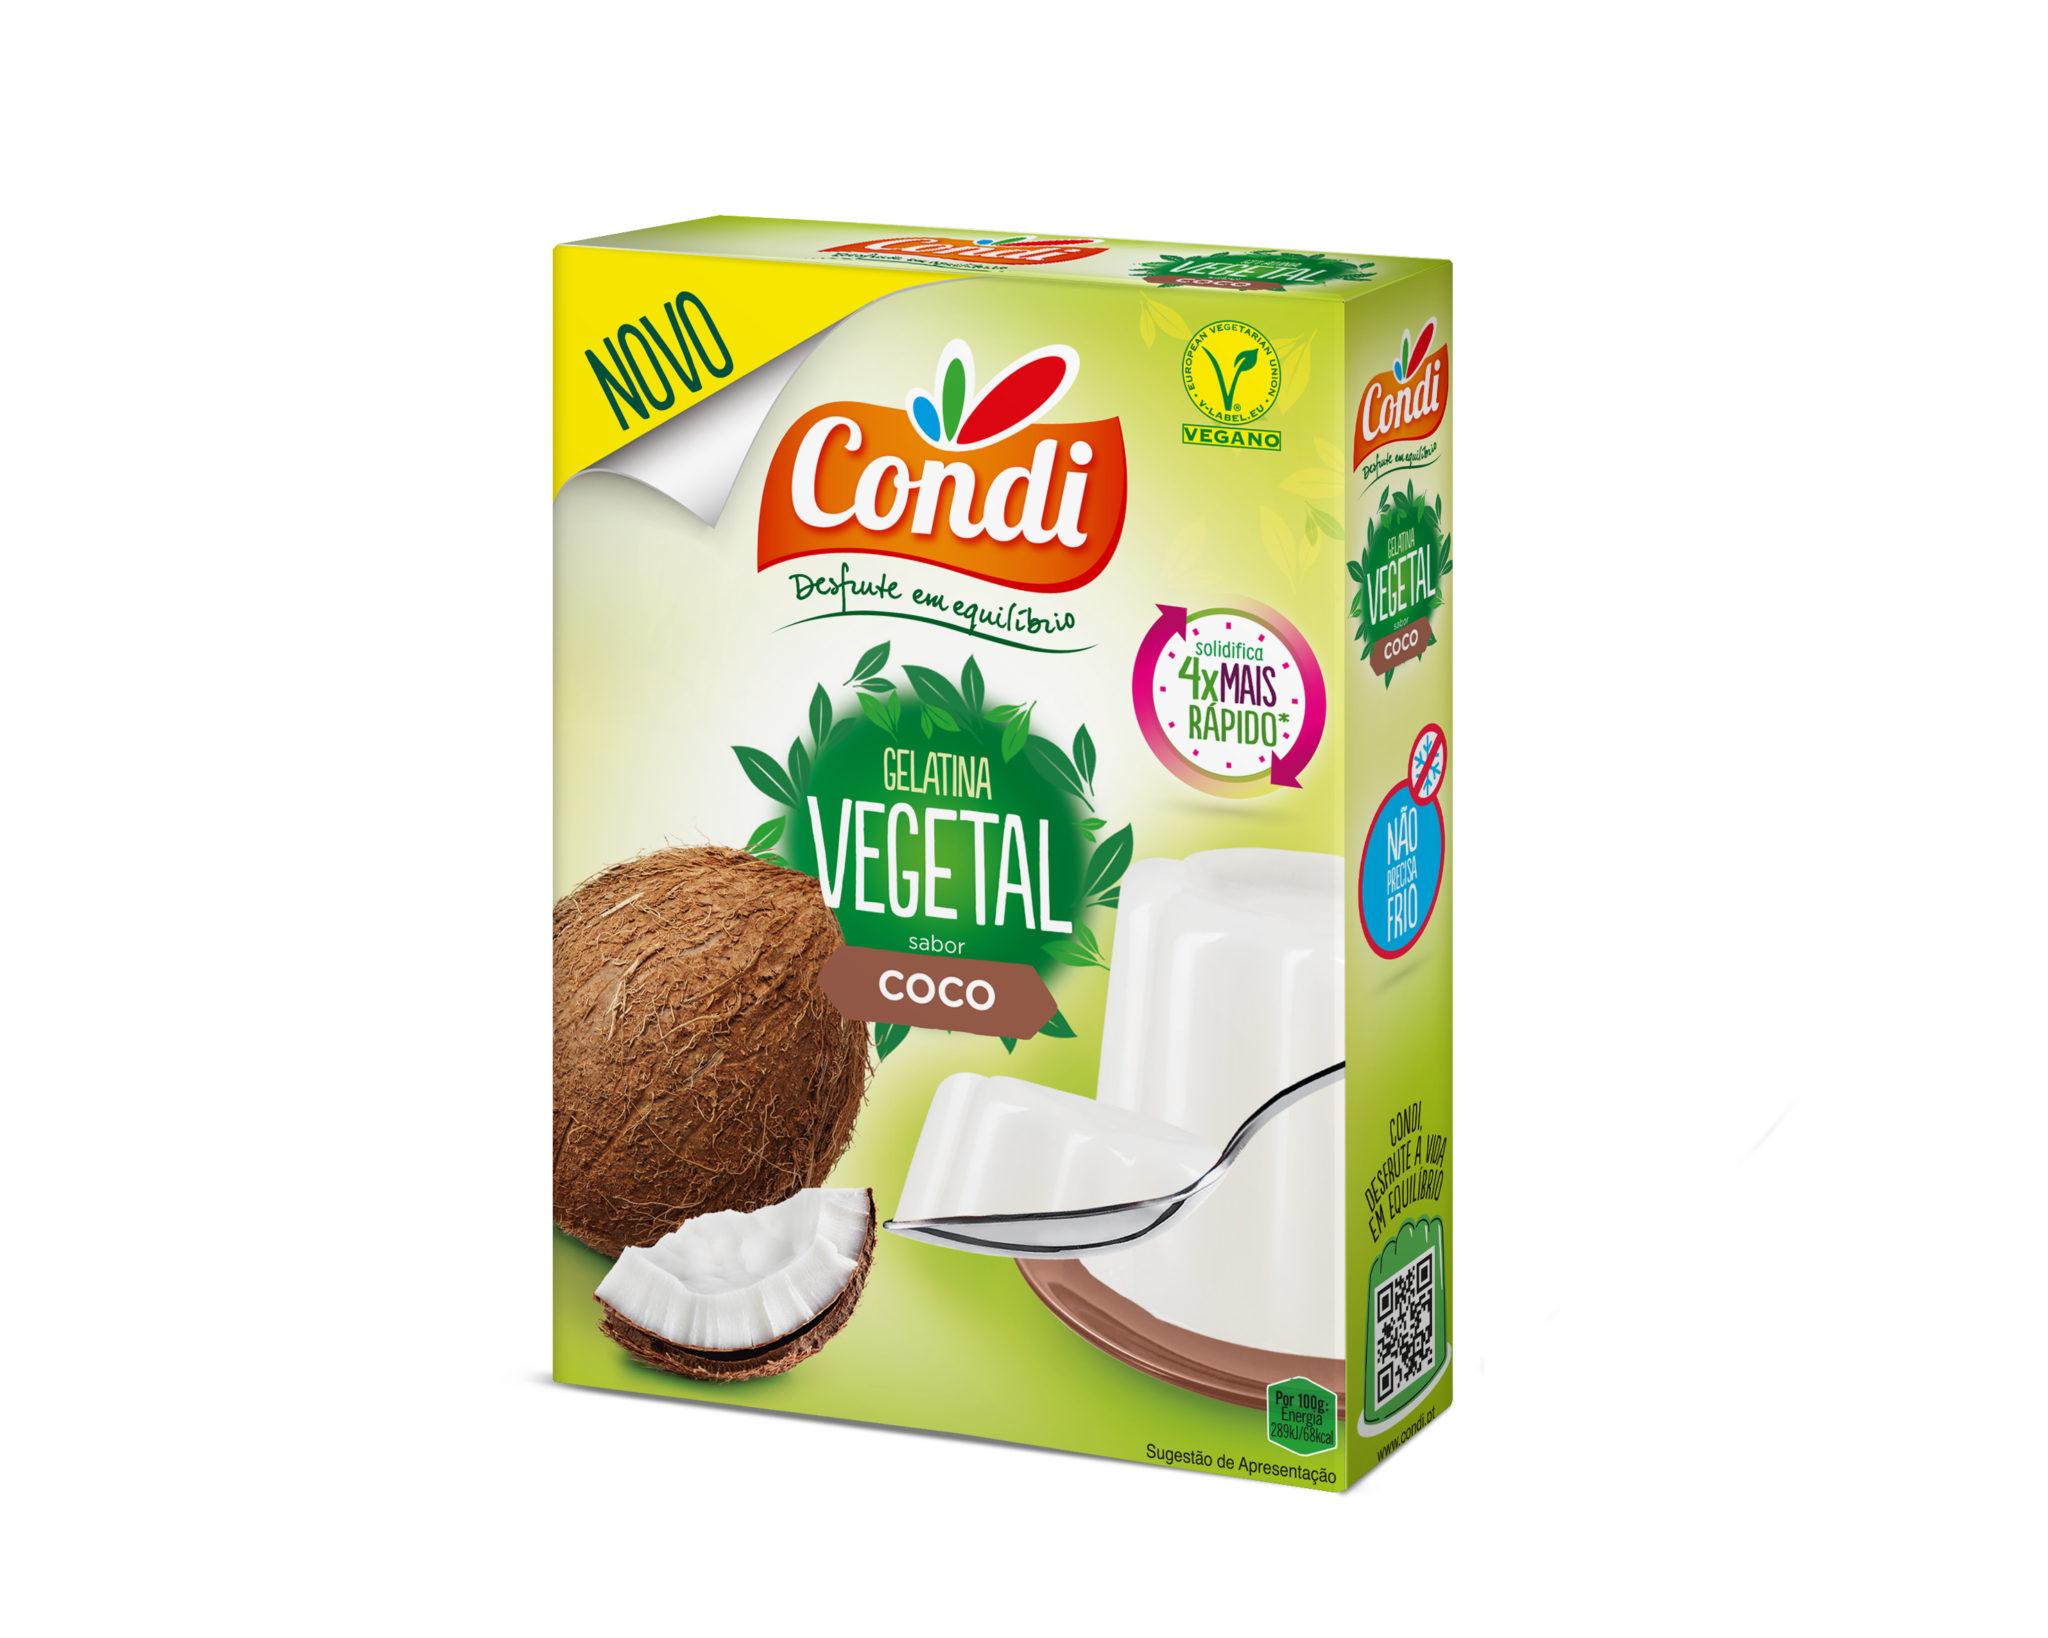 Gelatina Vegetal Coco_ PVP 1.99€